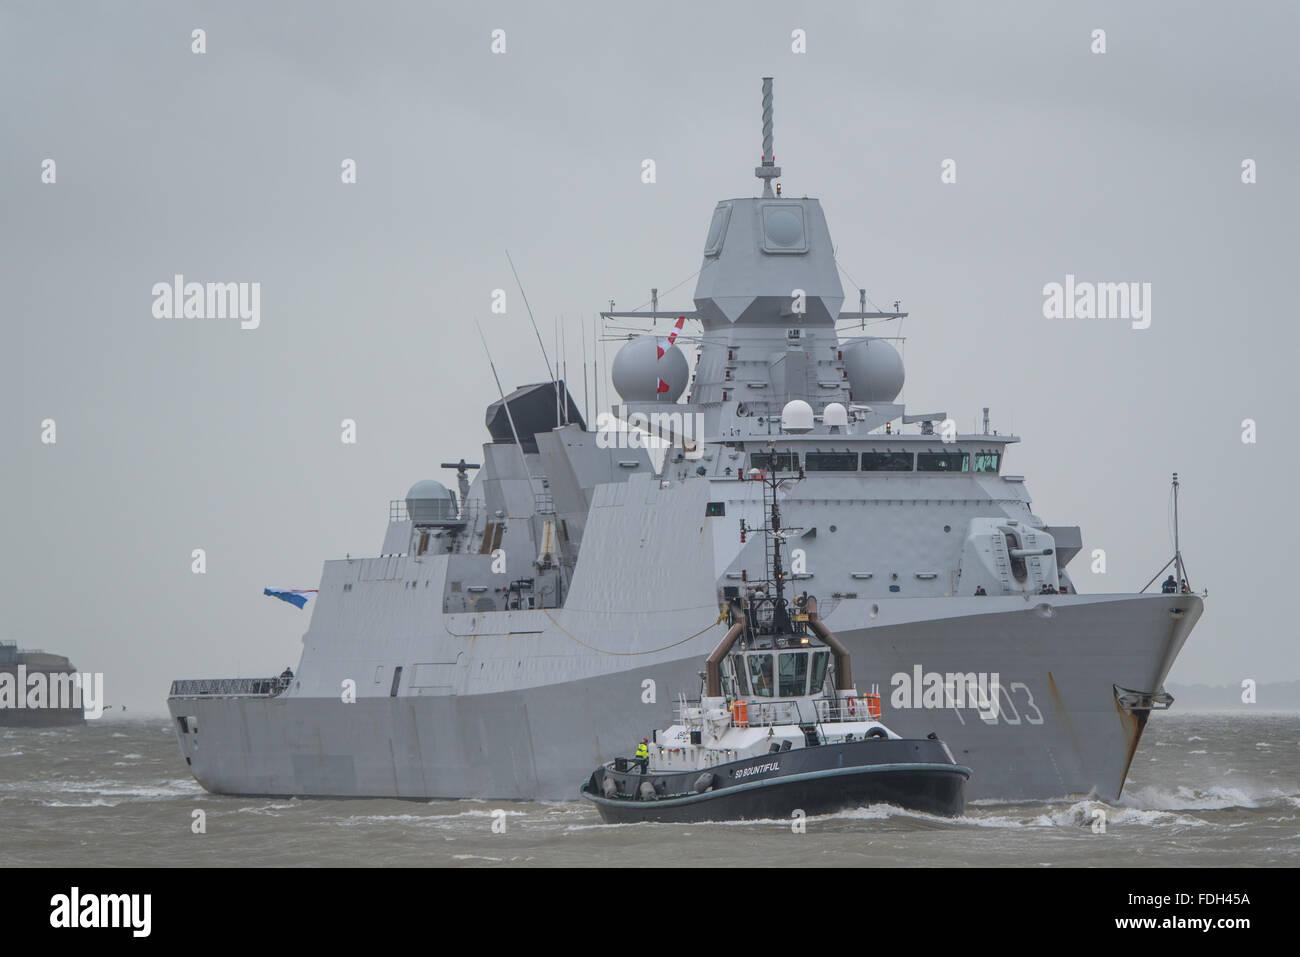 The Dutch Navy (Koninklijke Marine) frigate HNLMS Tromp (F803) arriving at Portsmouth, UK on the 29th January 2016. - Stock Image